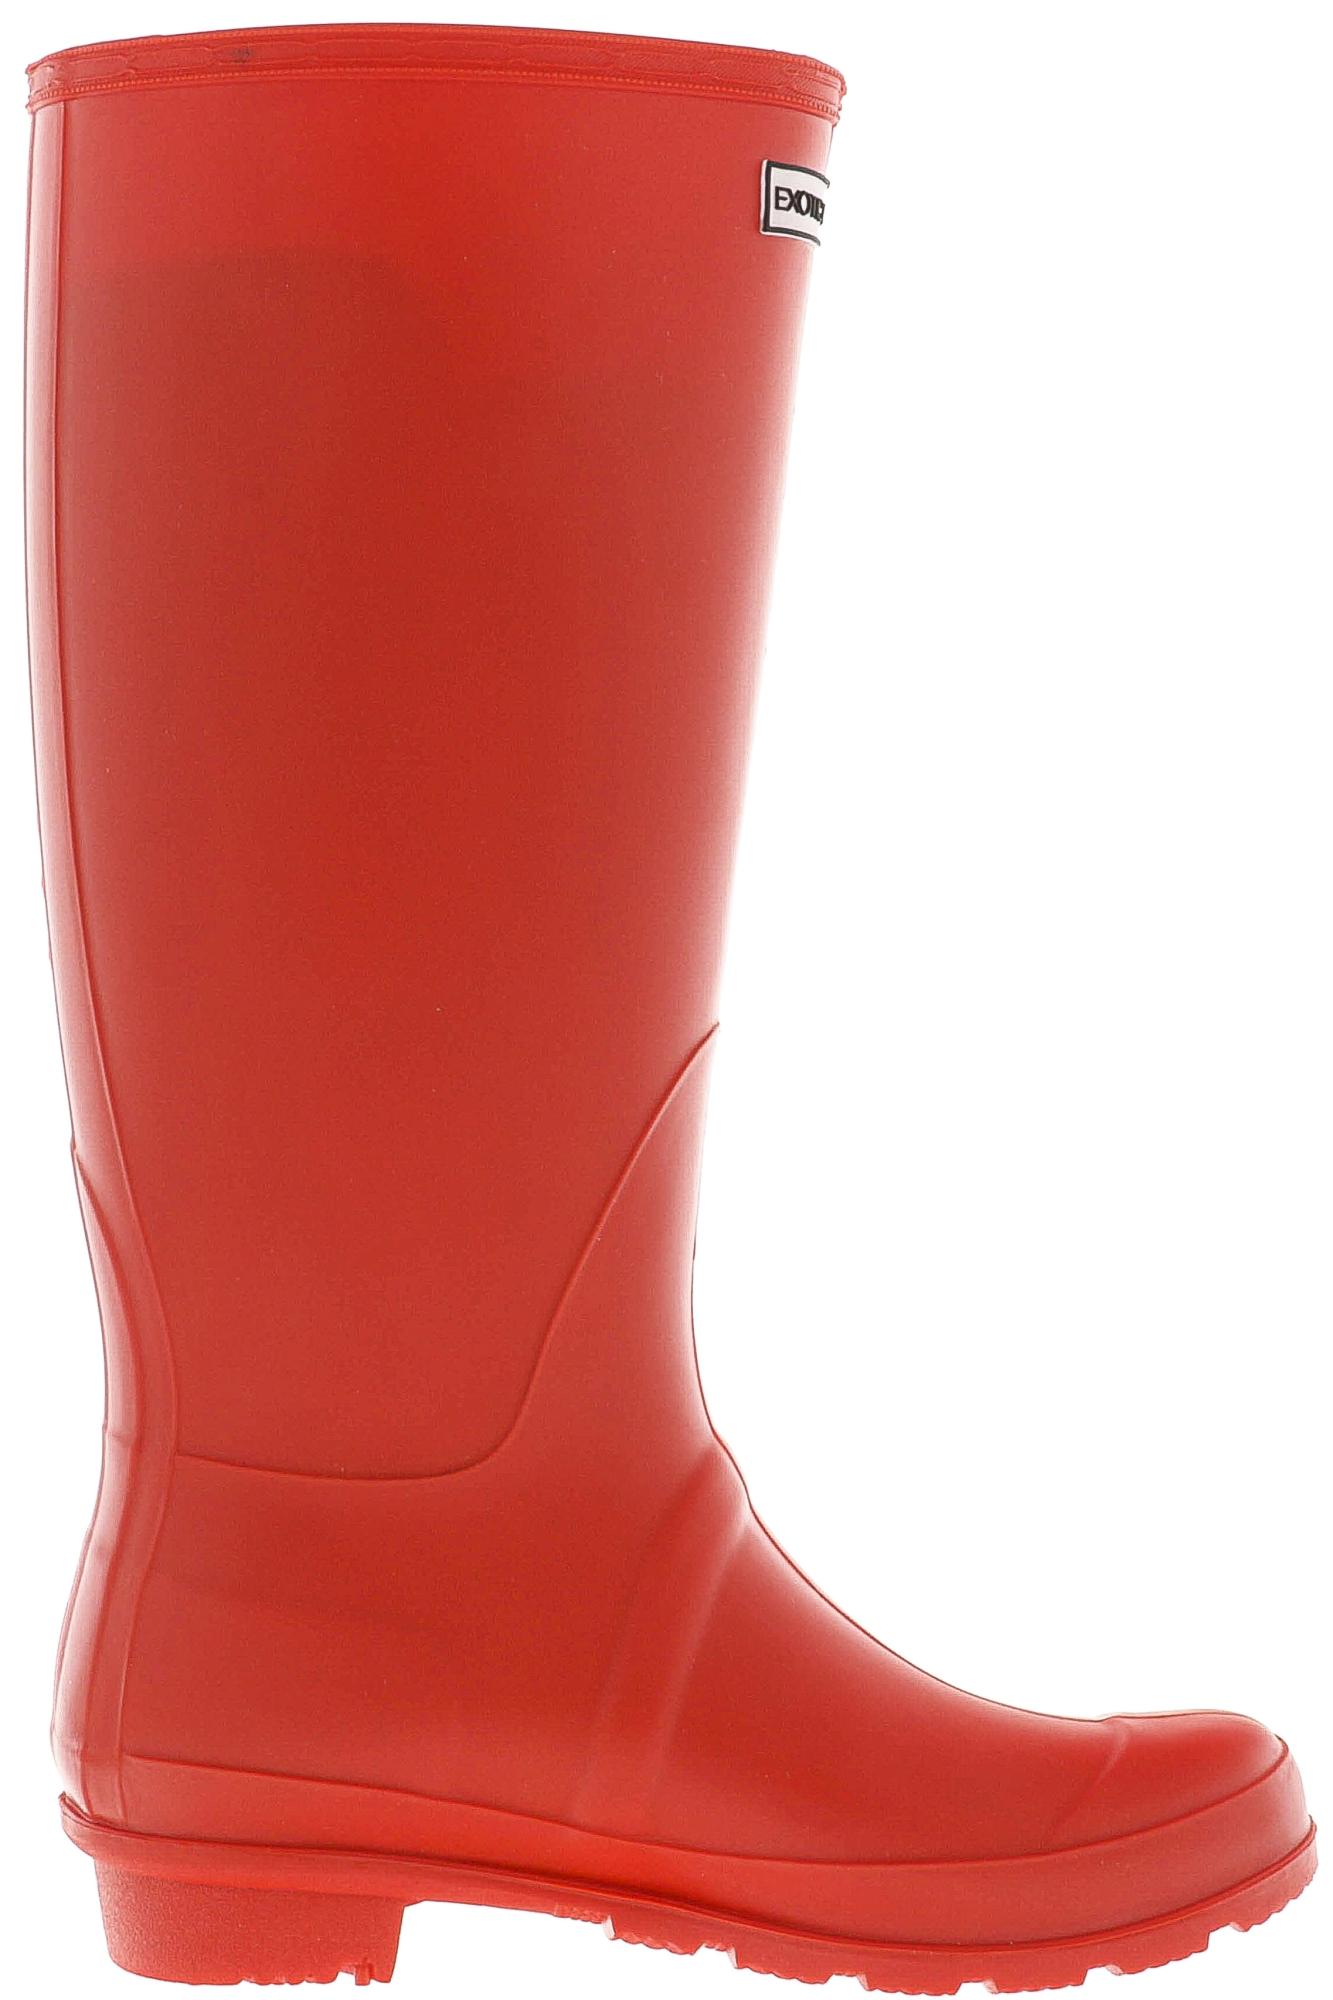 Exotic-Identity-Original-Tall-Rain-Boots-Waterproof-Premium-PVC-Nonslip-So thumbnail 39